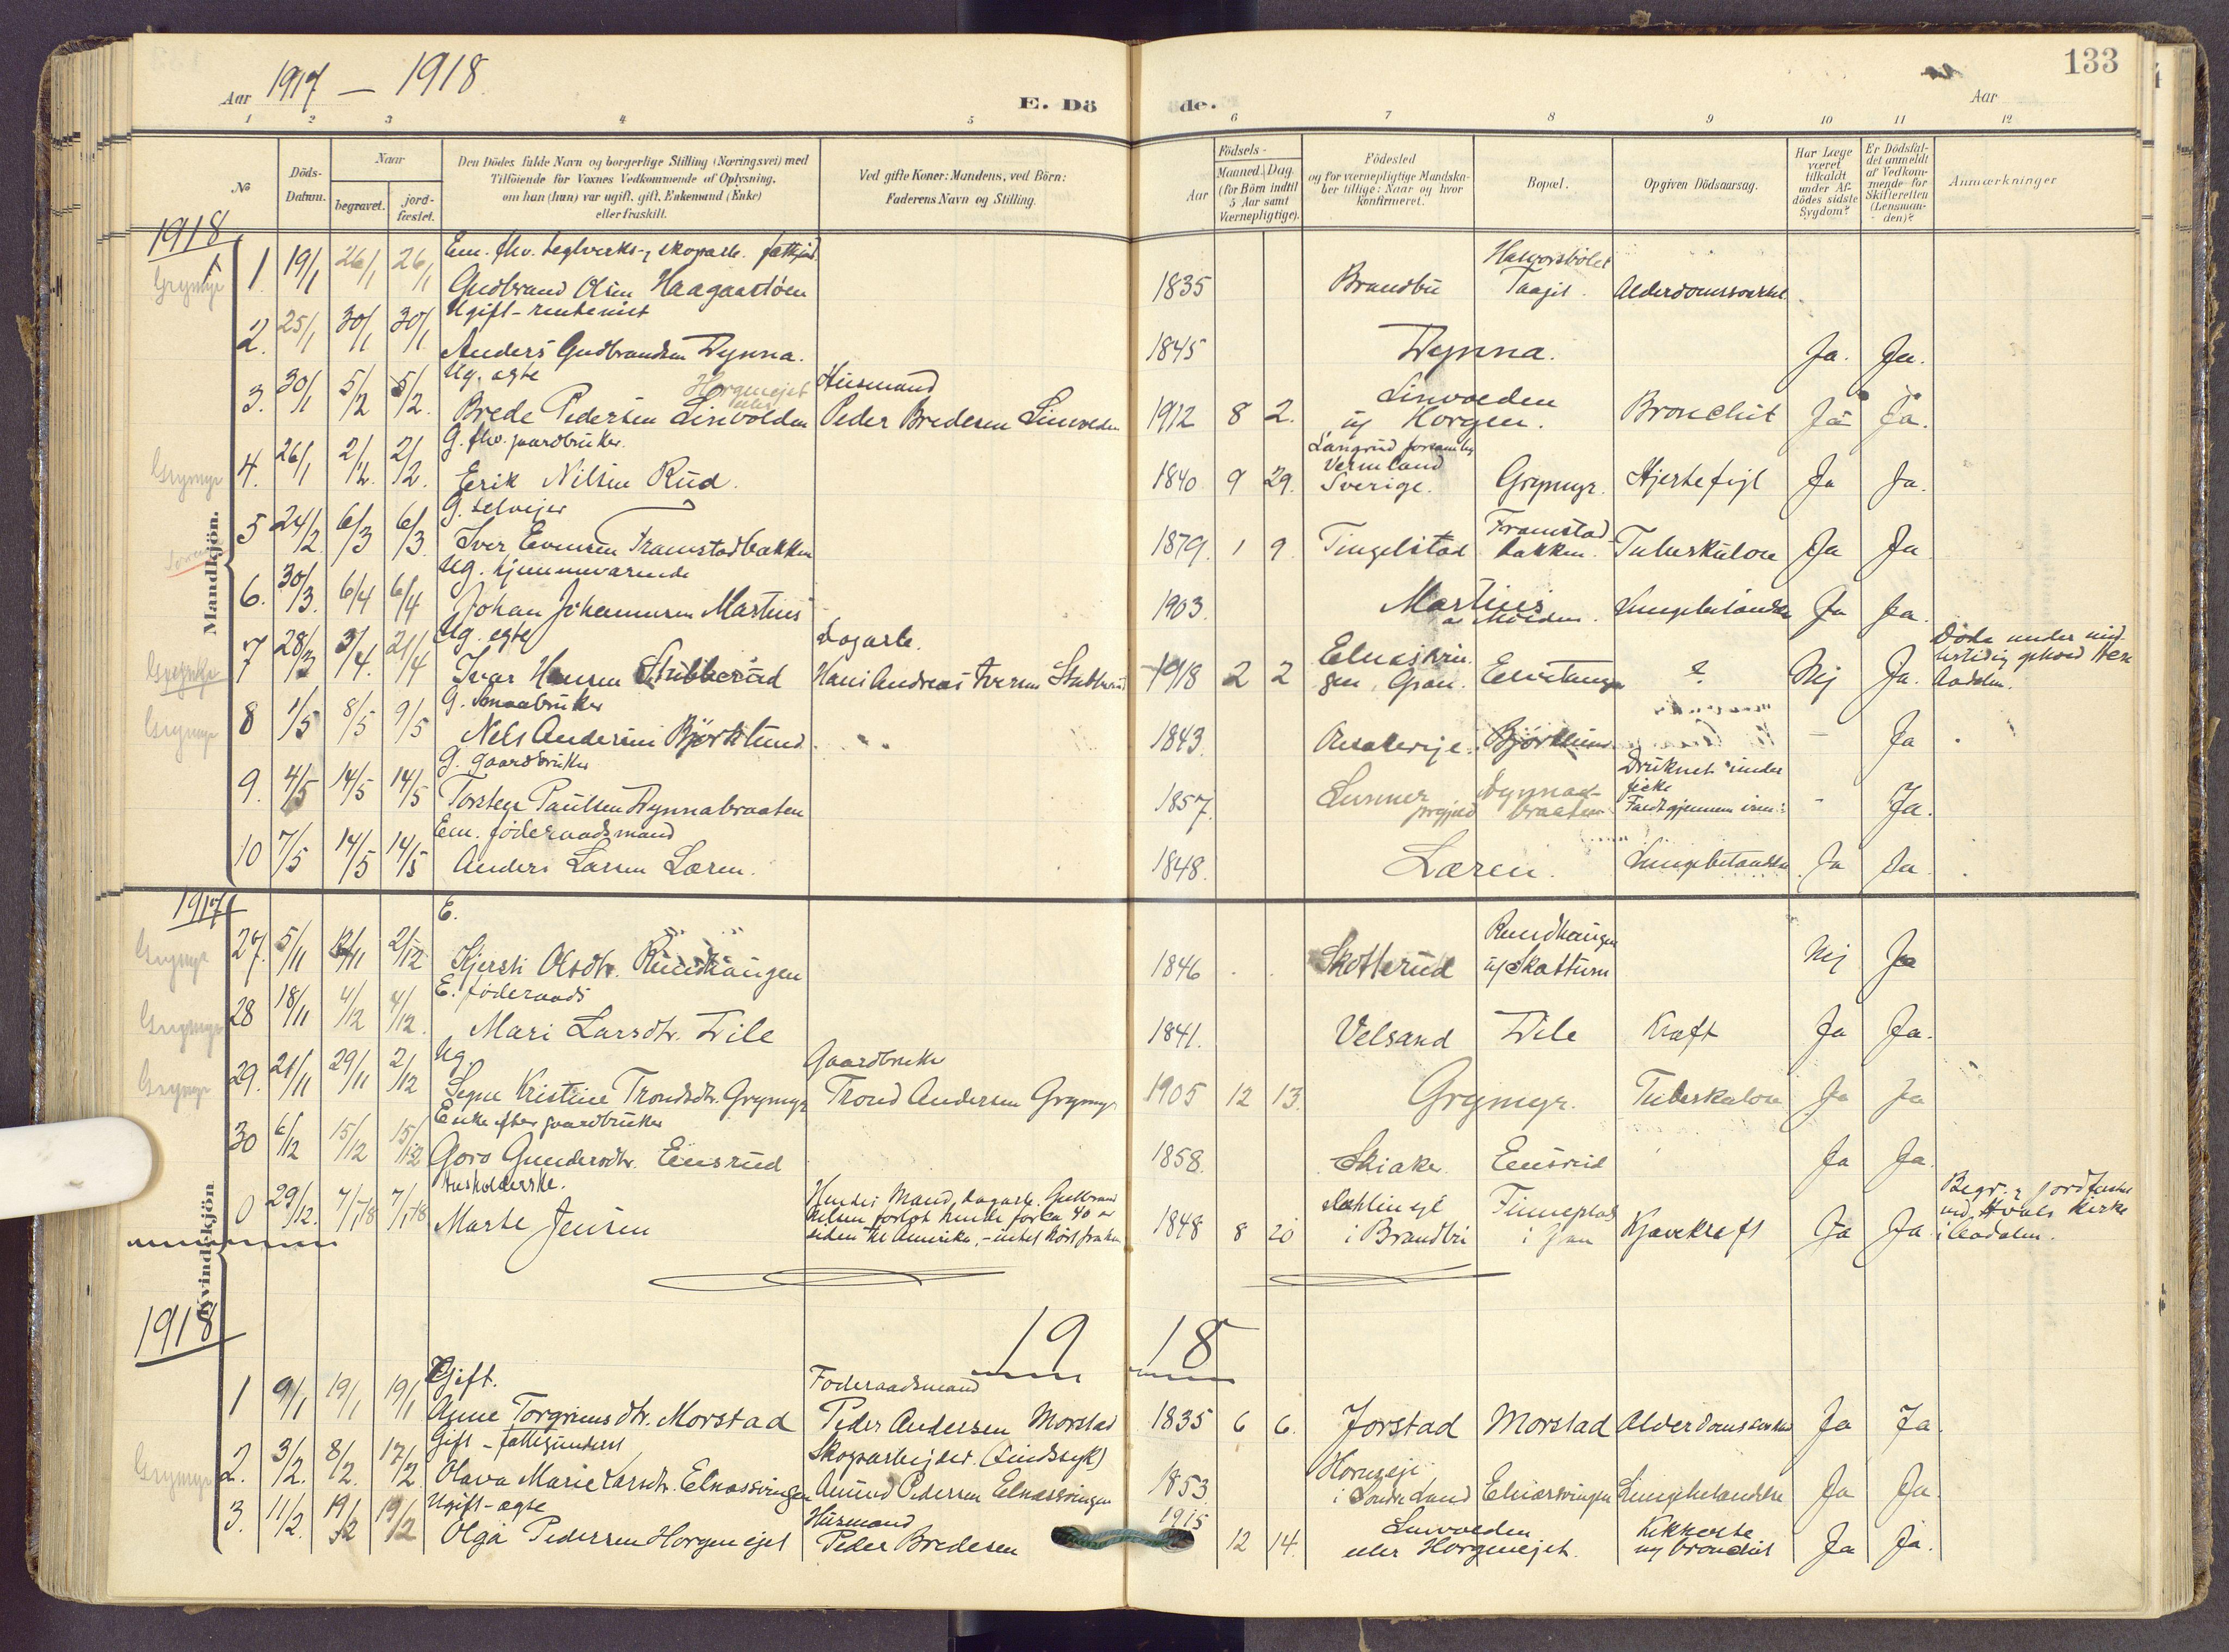 SAH, Gran prestekontor, Ministerialbok nr. 22, 1908-1918, s. 133